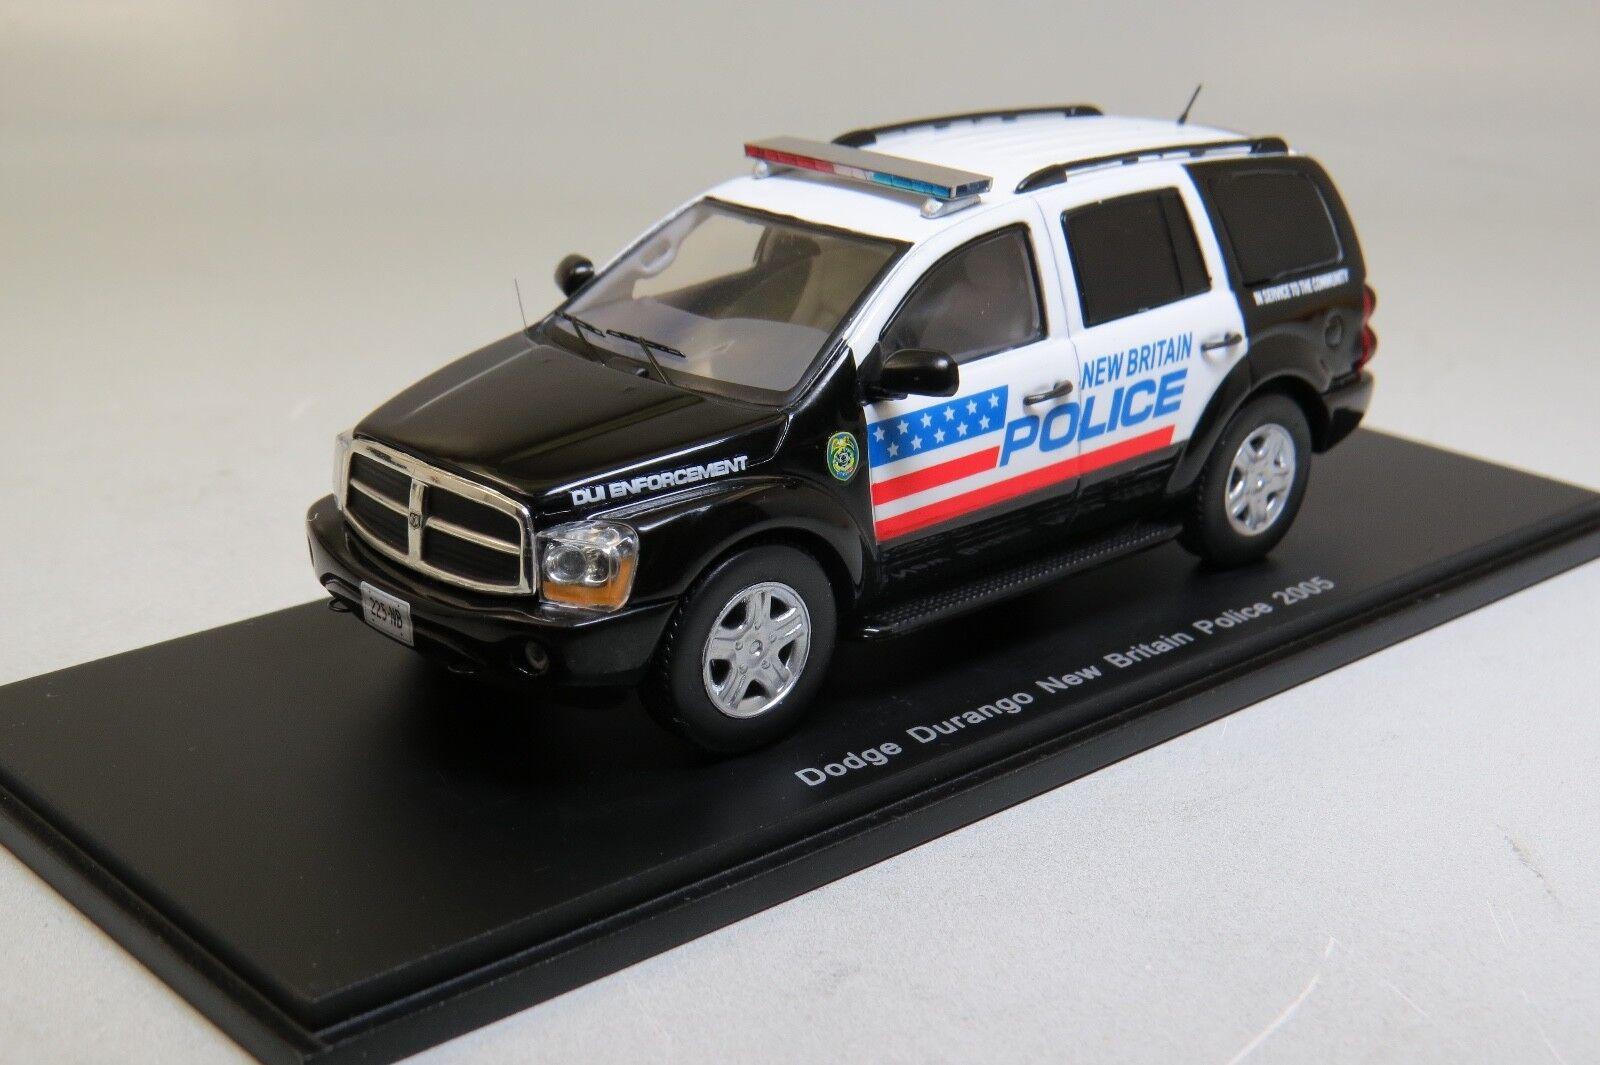 Dodge Durango New Britain Police 2005 Spark S0864 1:43